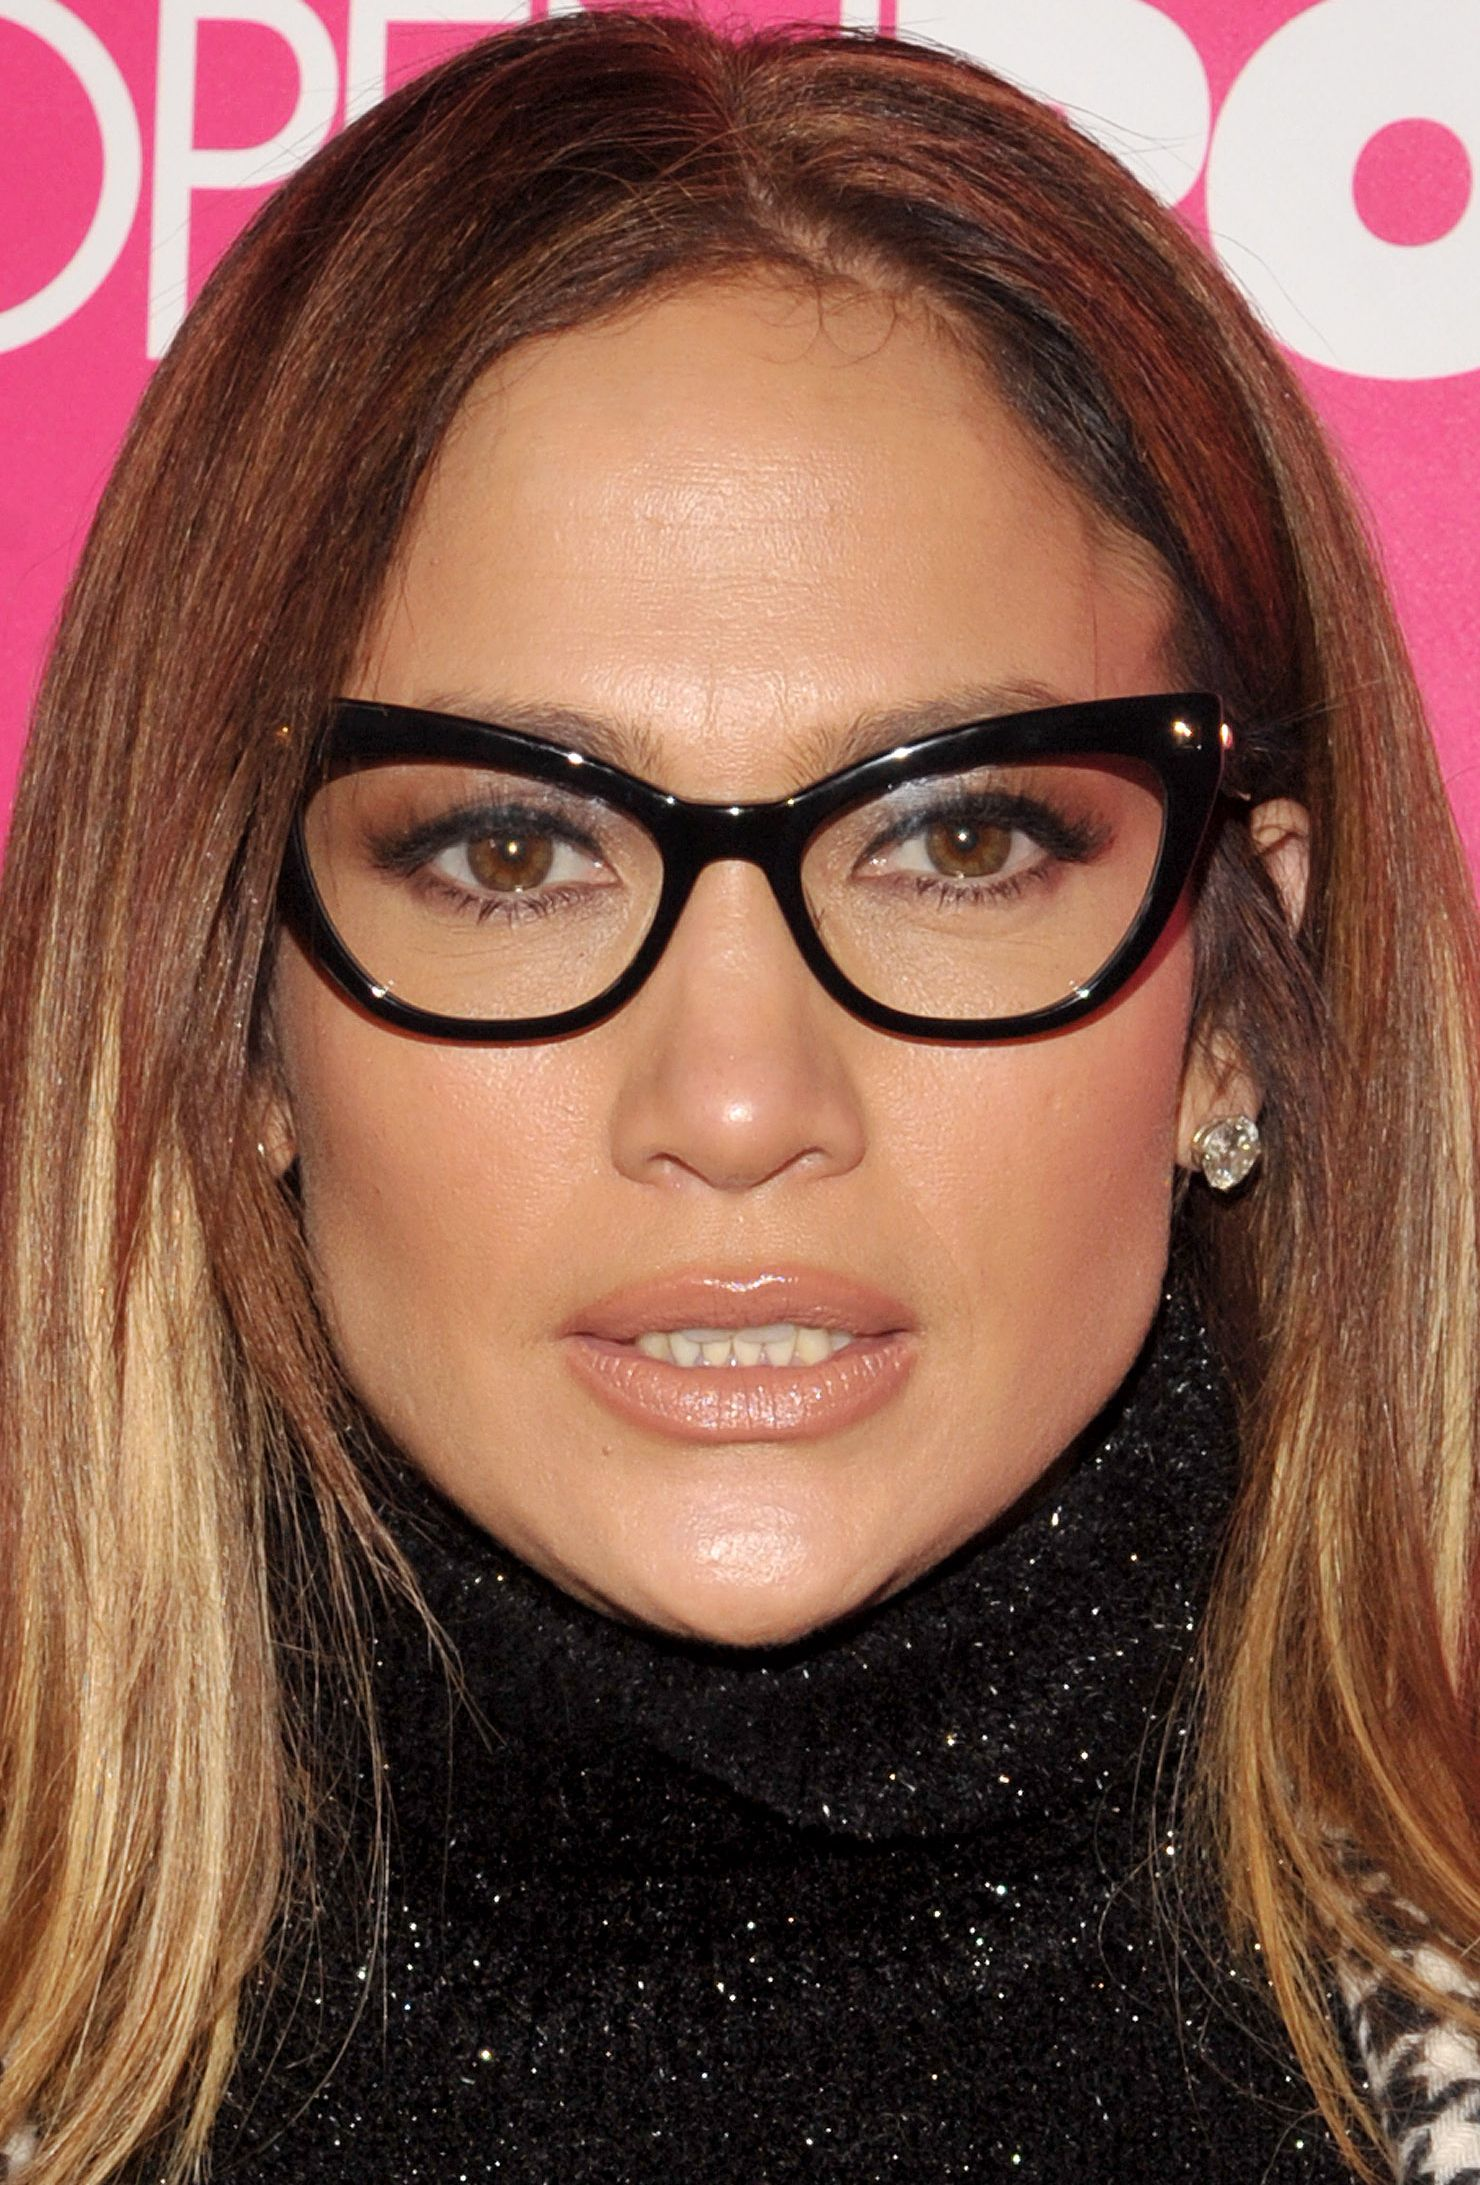 jenniferlopez-ukraine.blogspot.com #JenniferLopez #JLo #makeup ...